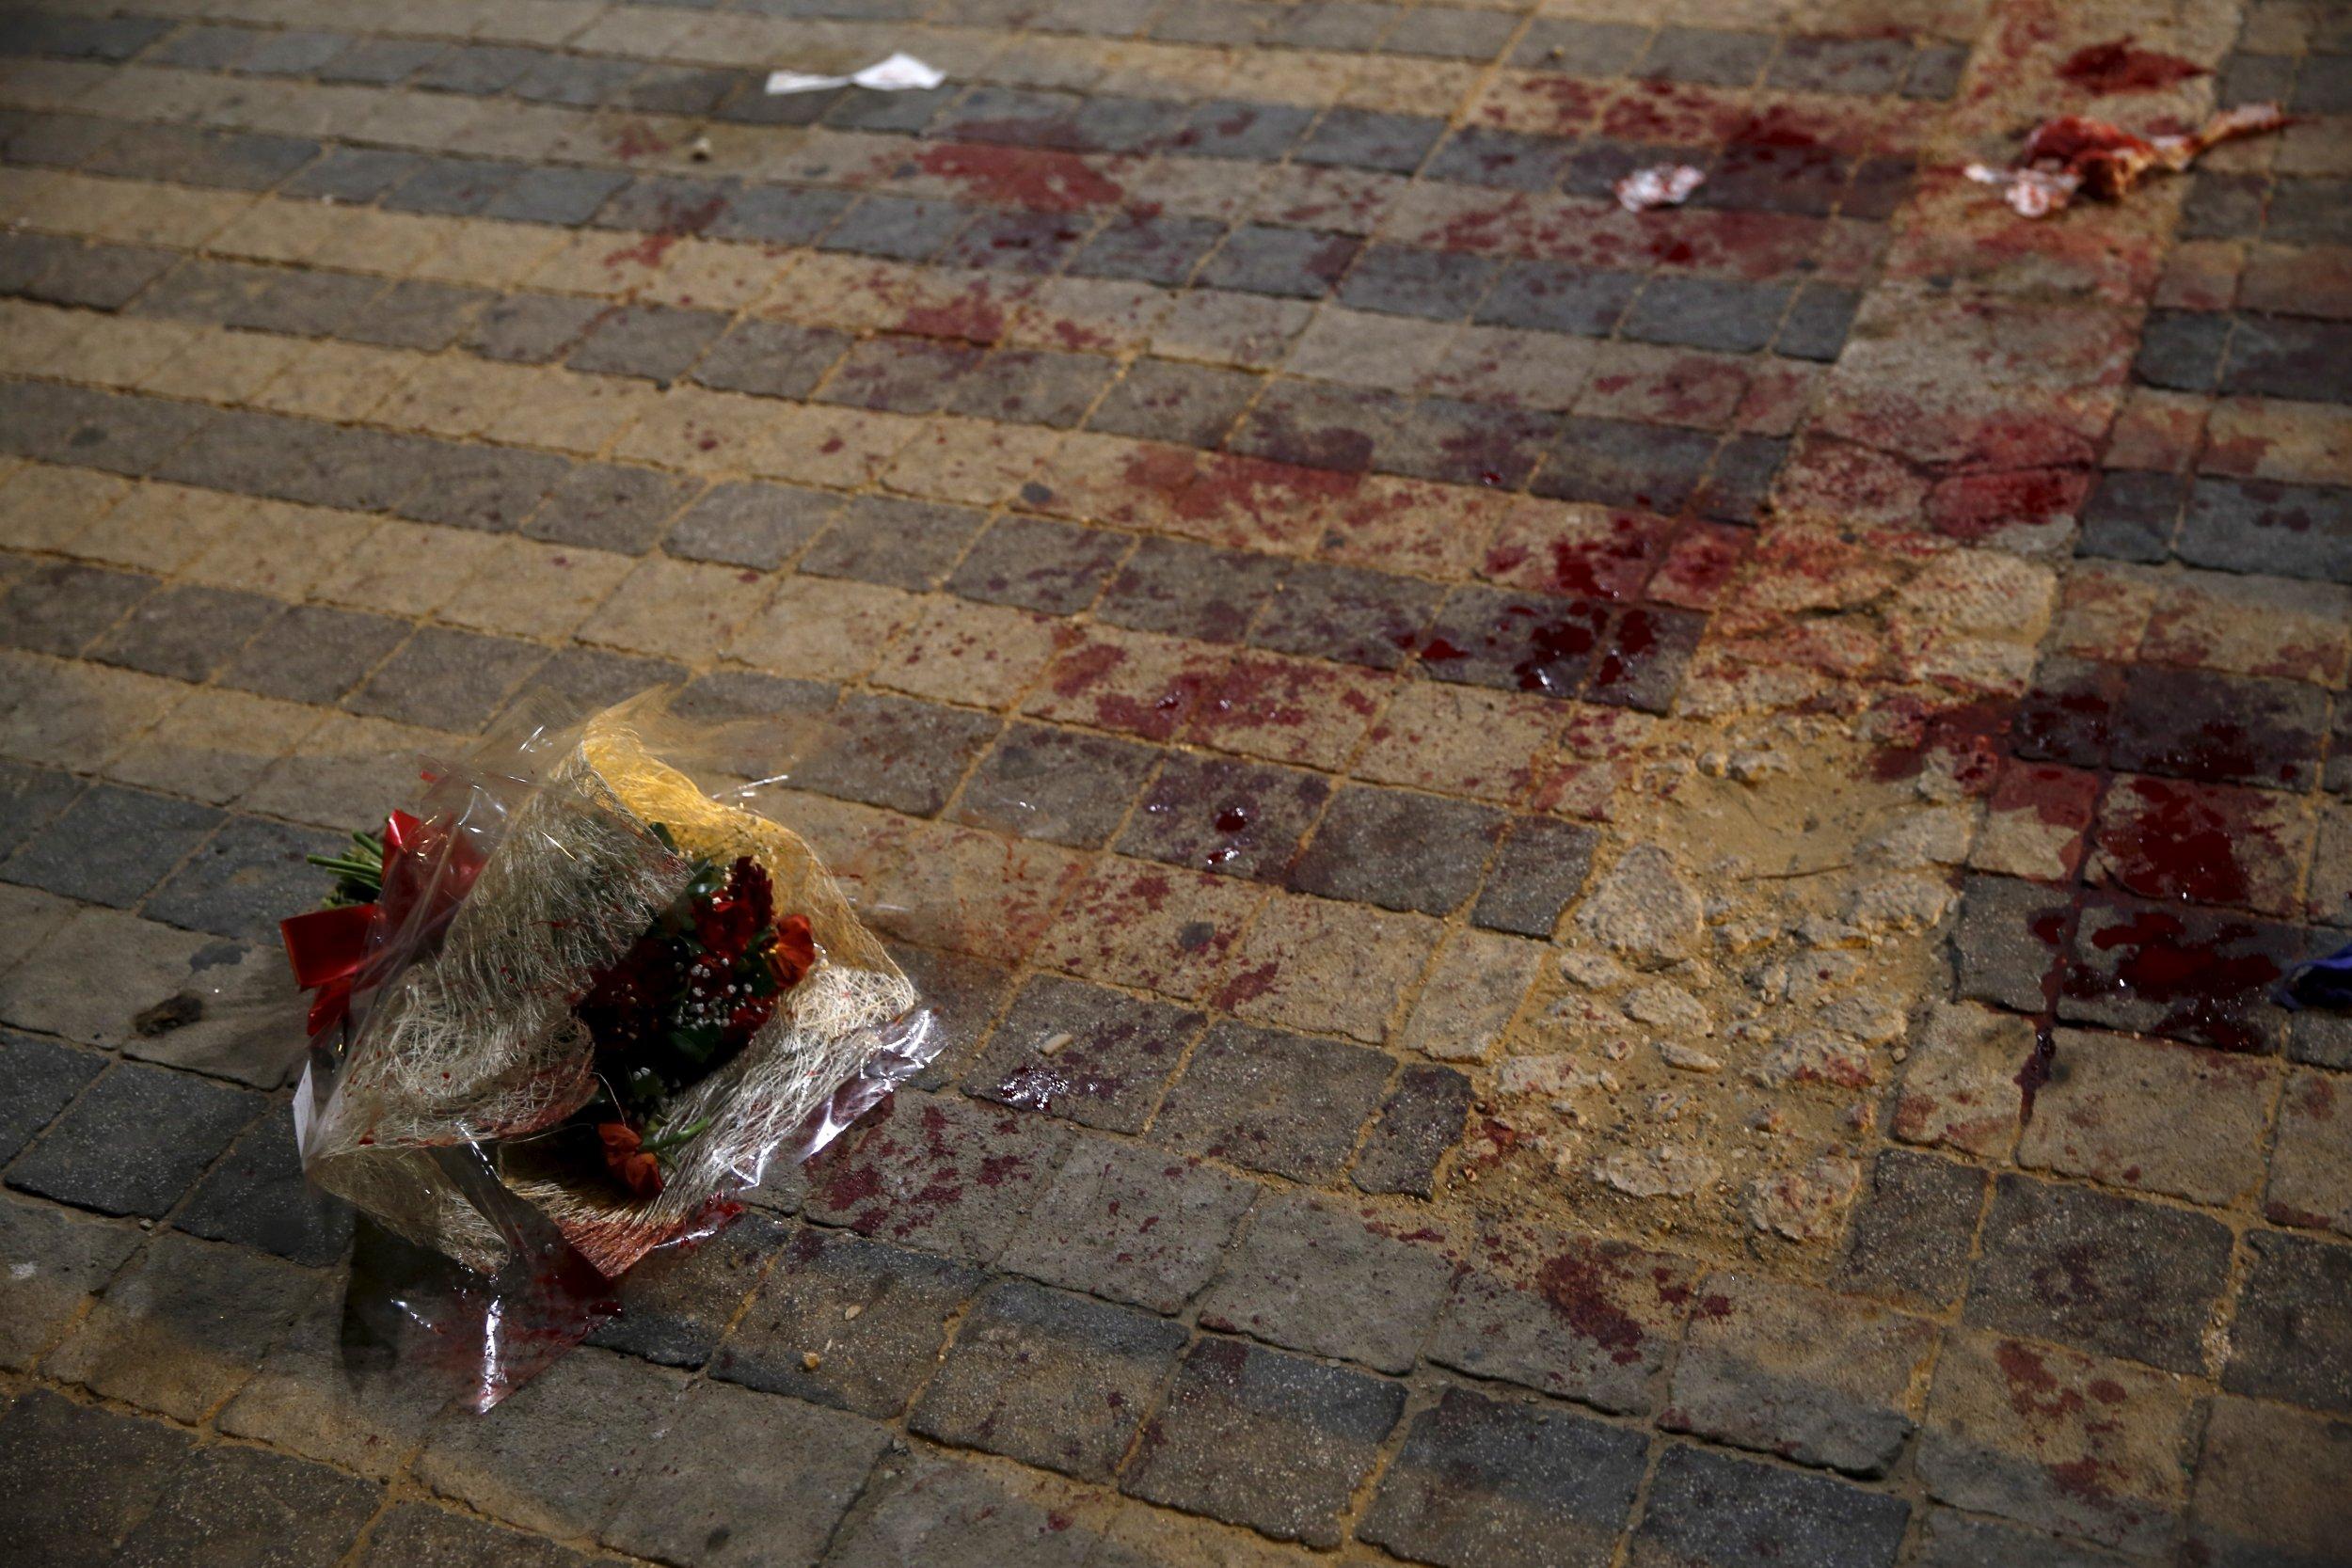 Israel Palestinians Middle East Stabbing Shooting